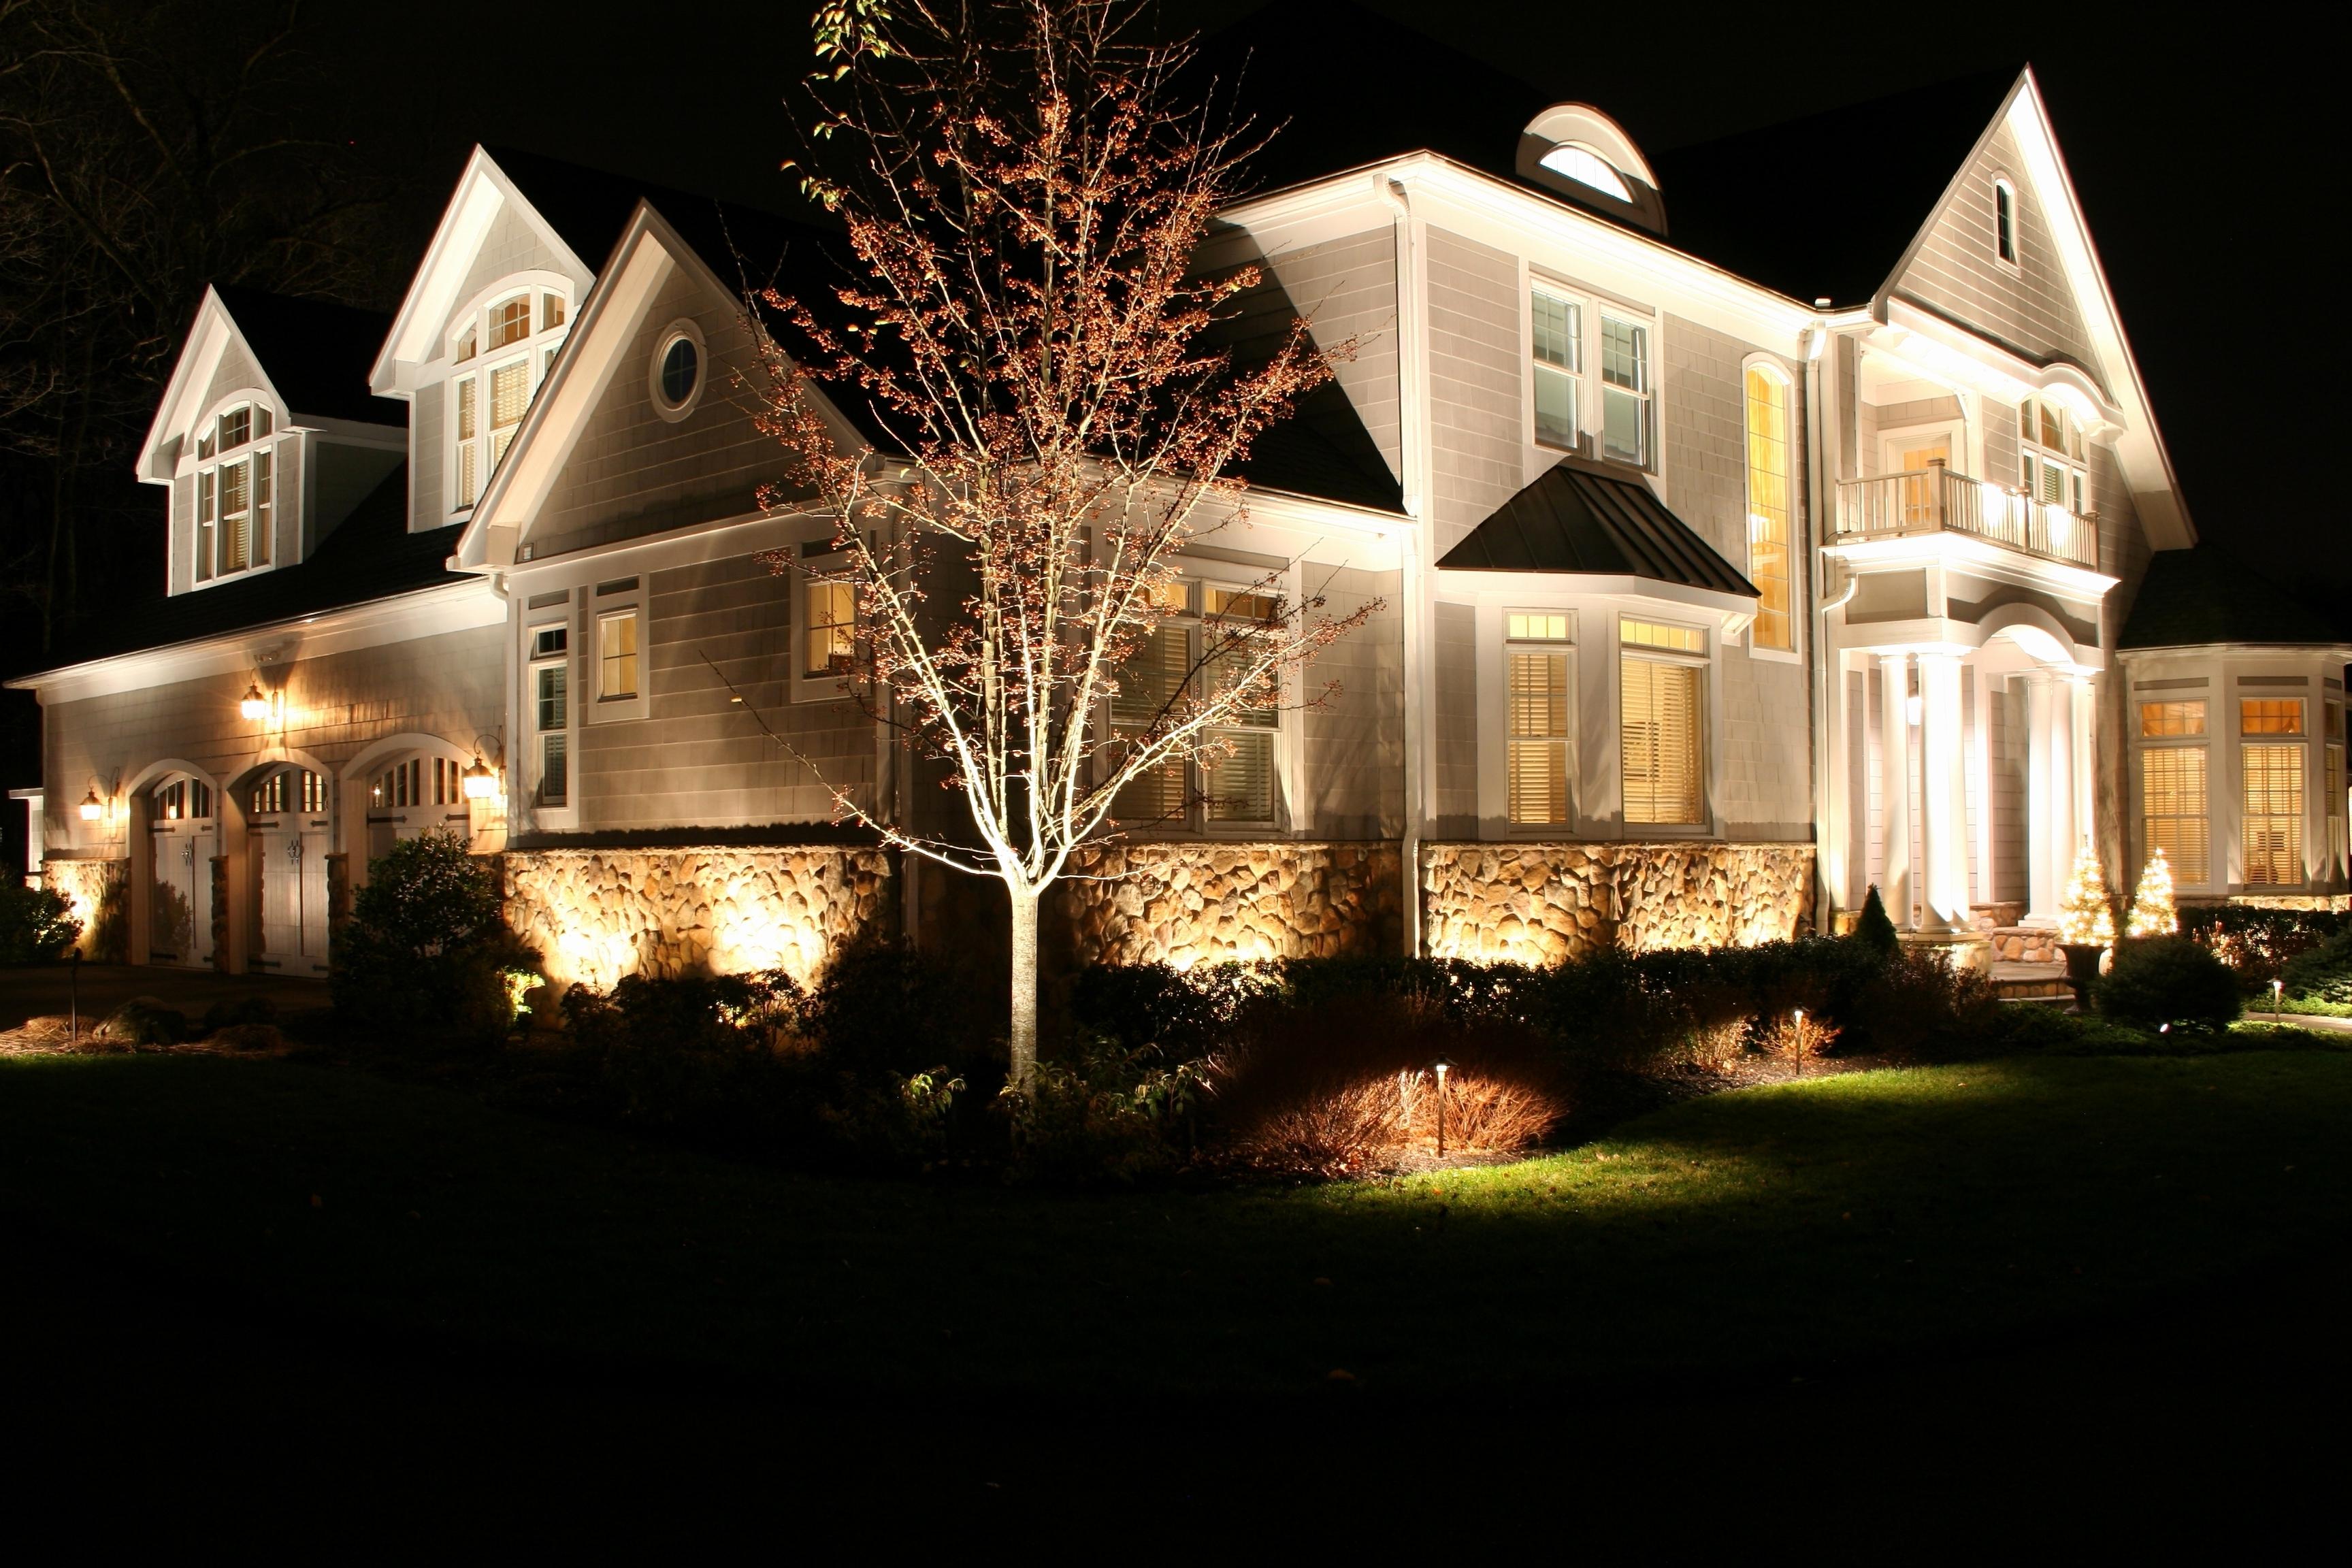 Kichler Outdoor Landscape Lighting (View 6 of 20)